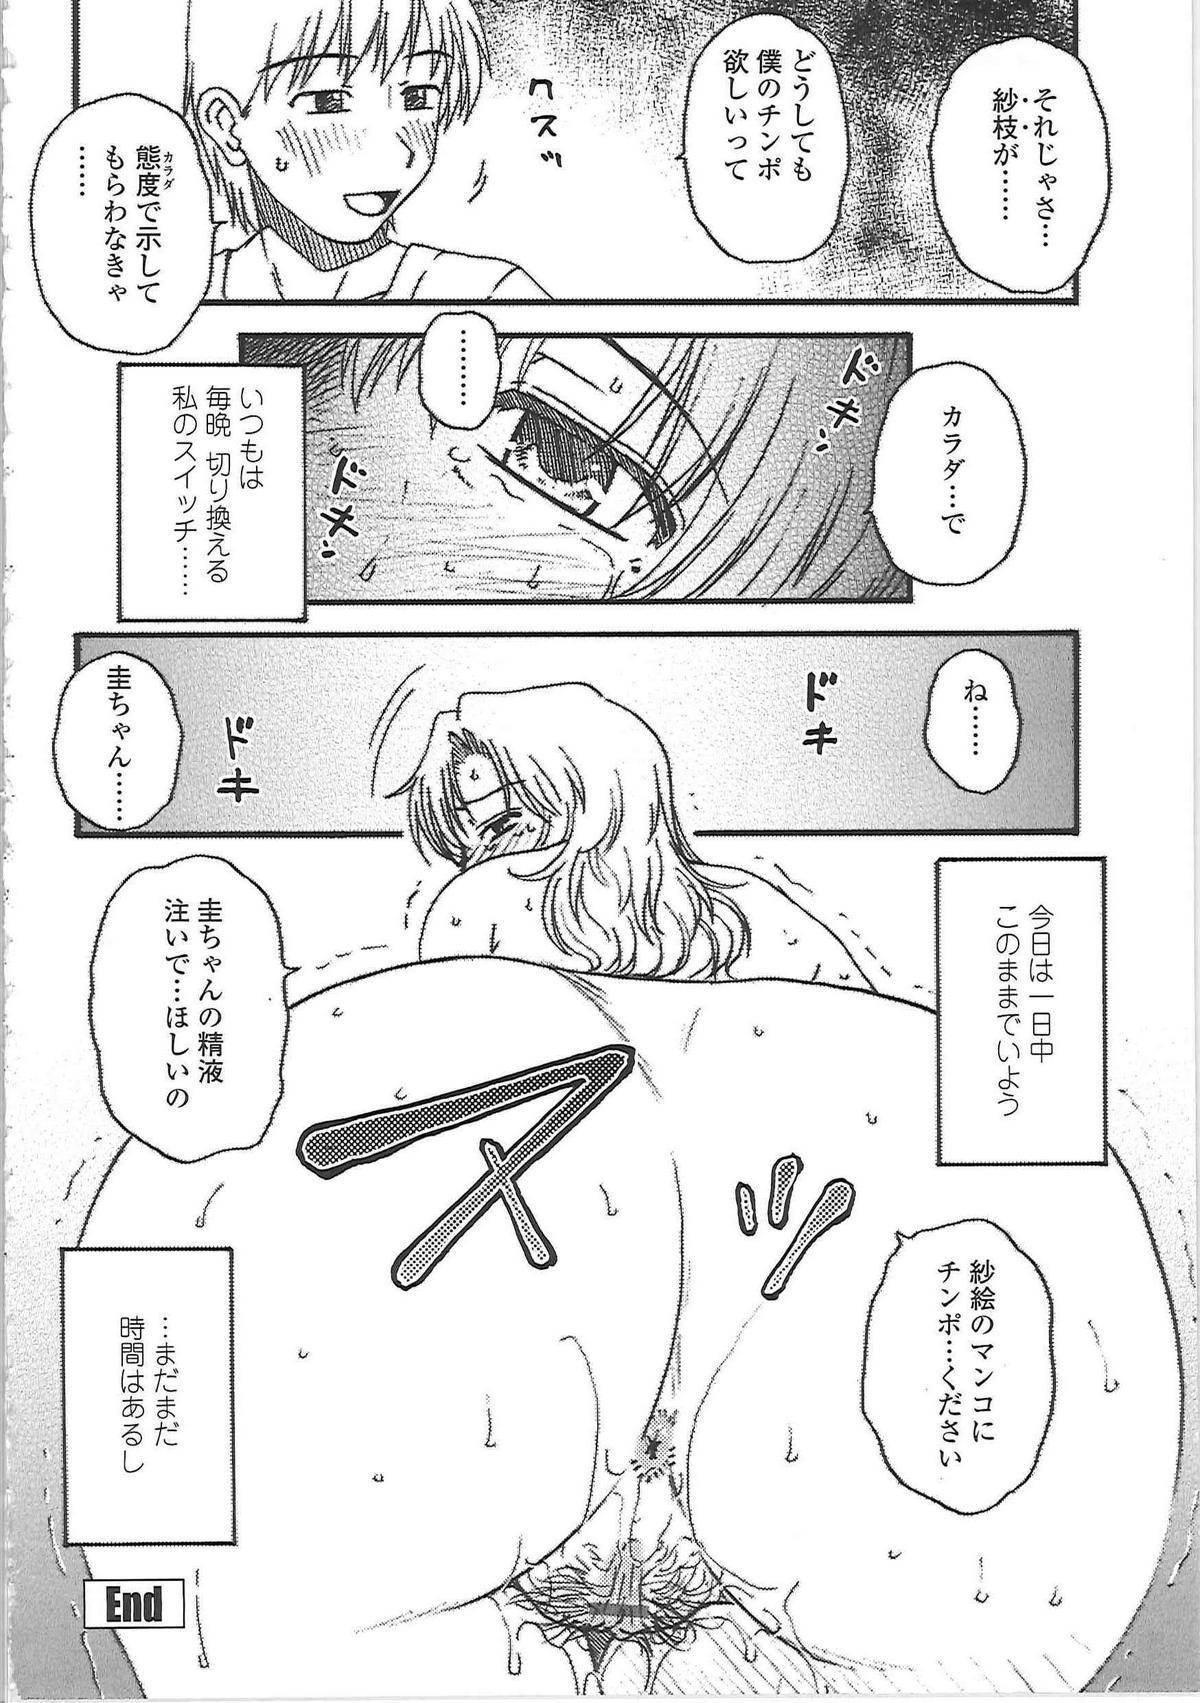 Nikuzuma Tsuushin - Erotic Wife Communication 184